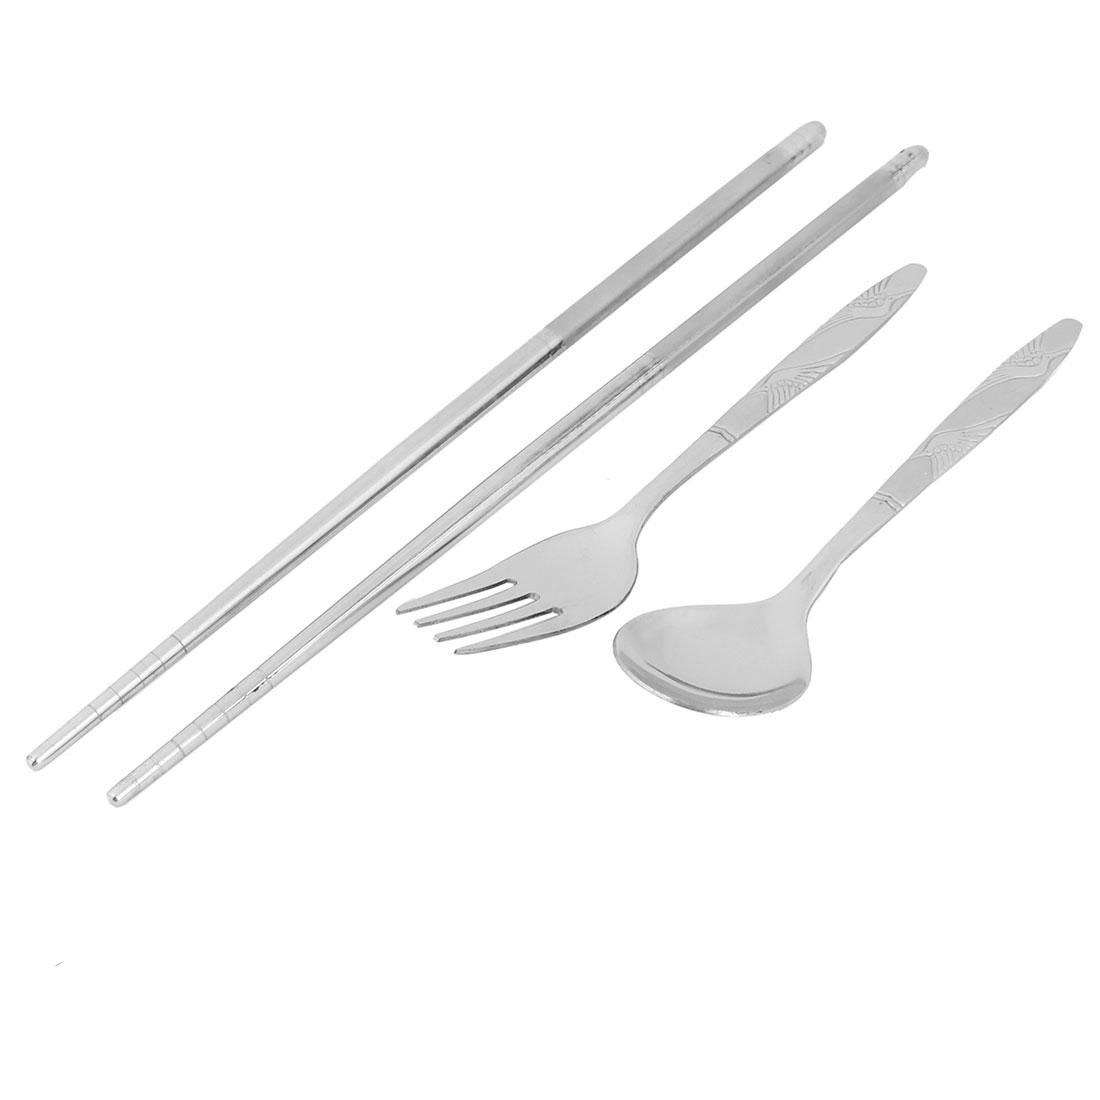 Silver-Tone-Stainless-Steel-Tableware-Chopsticks-Spoon-Fork-Cutlery-Set